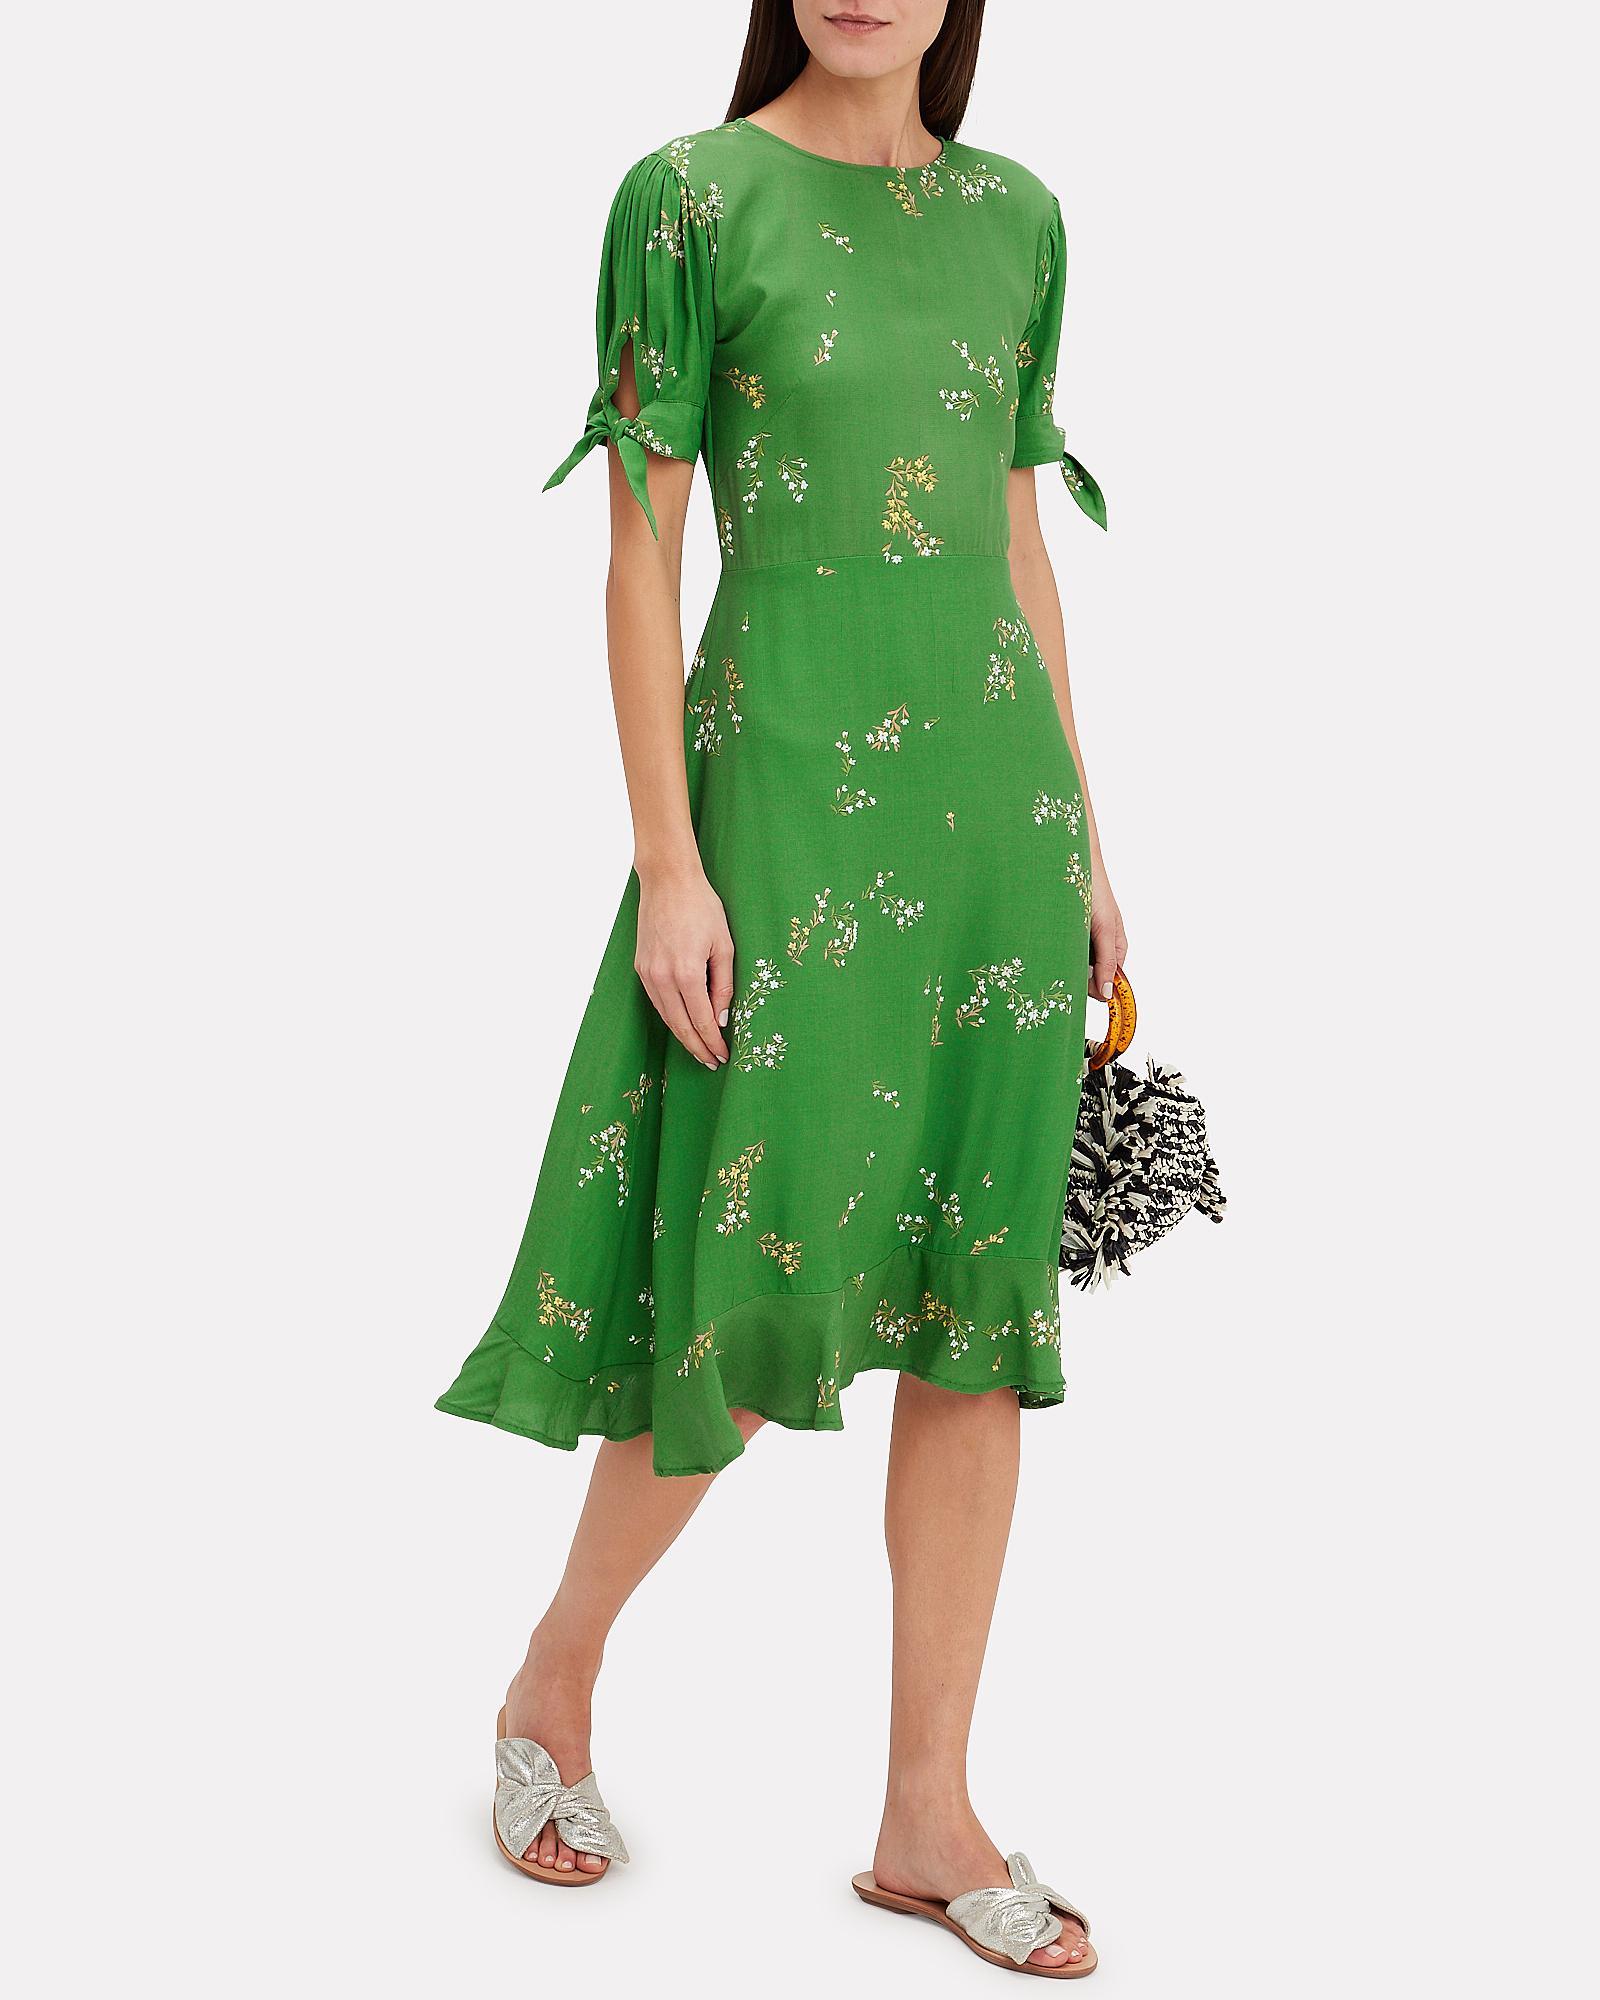 b04be04fd414 Faithfull The Brand Emilia Floral Midi Dress in Green - Lyst